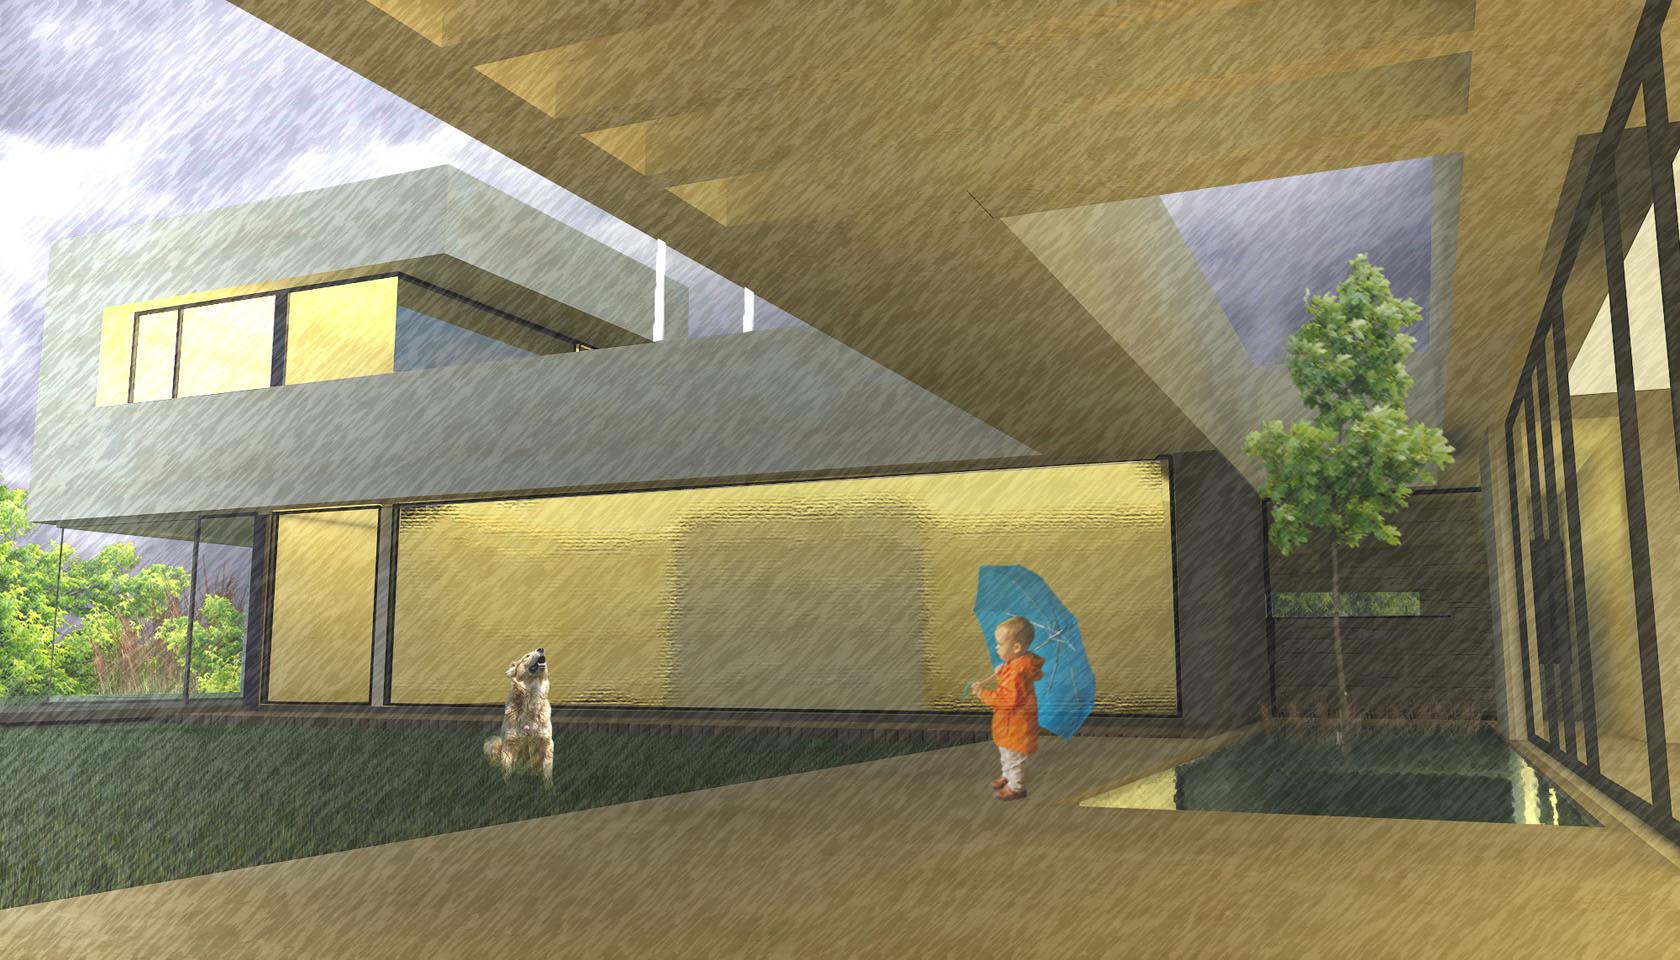 galerías modernas, pérgolas, diseño bioclimático